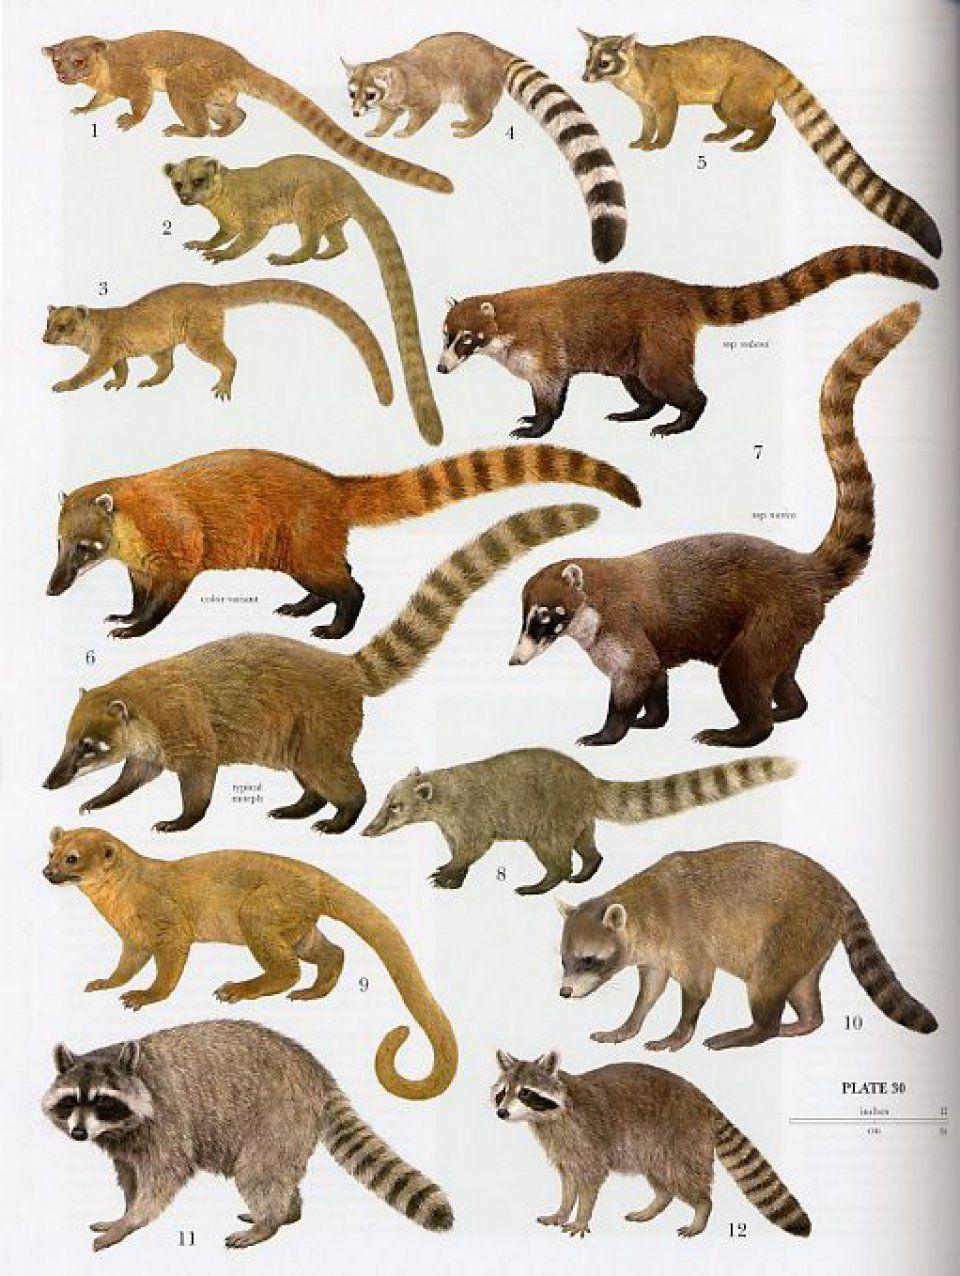 Pin de lord Mair George en mememe | Pinterest | Animales, Naturaleza ...